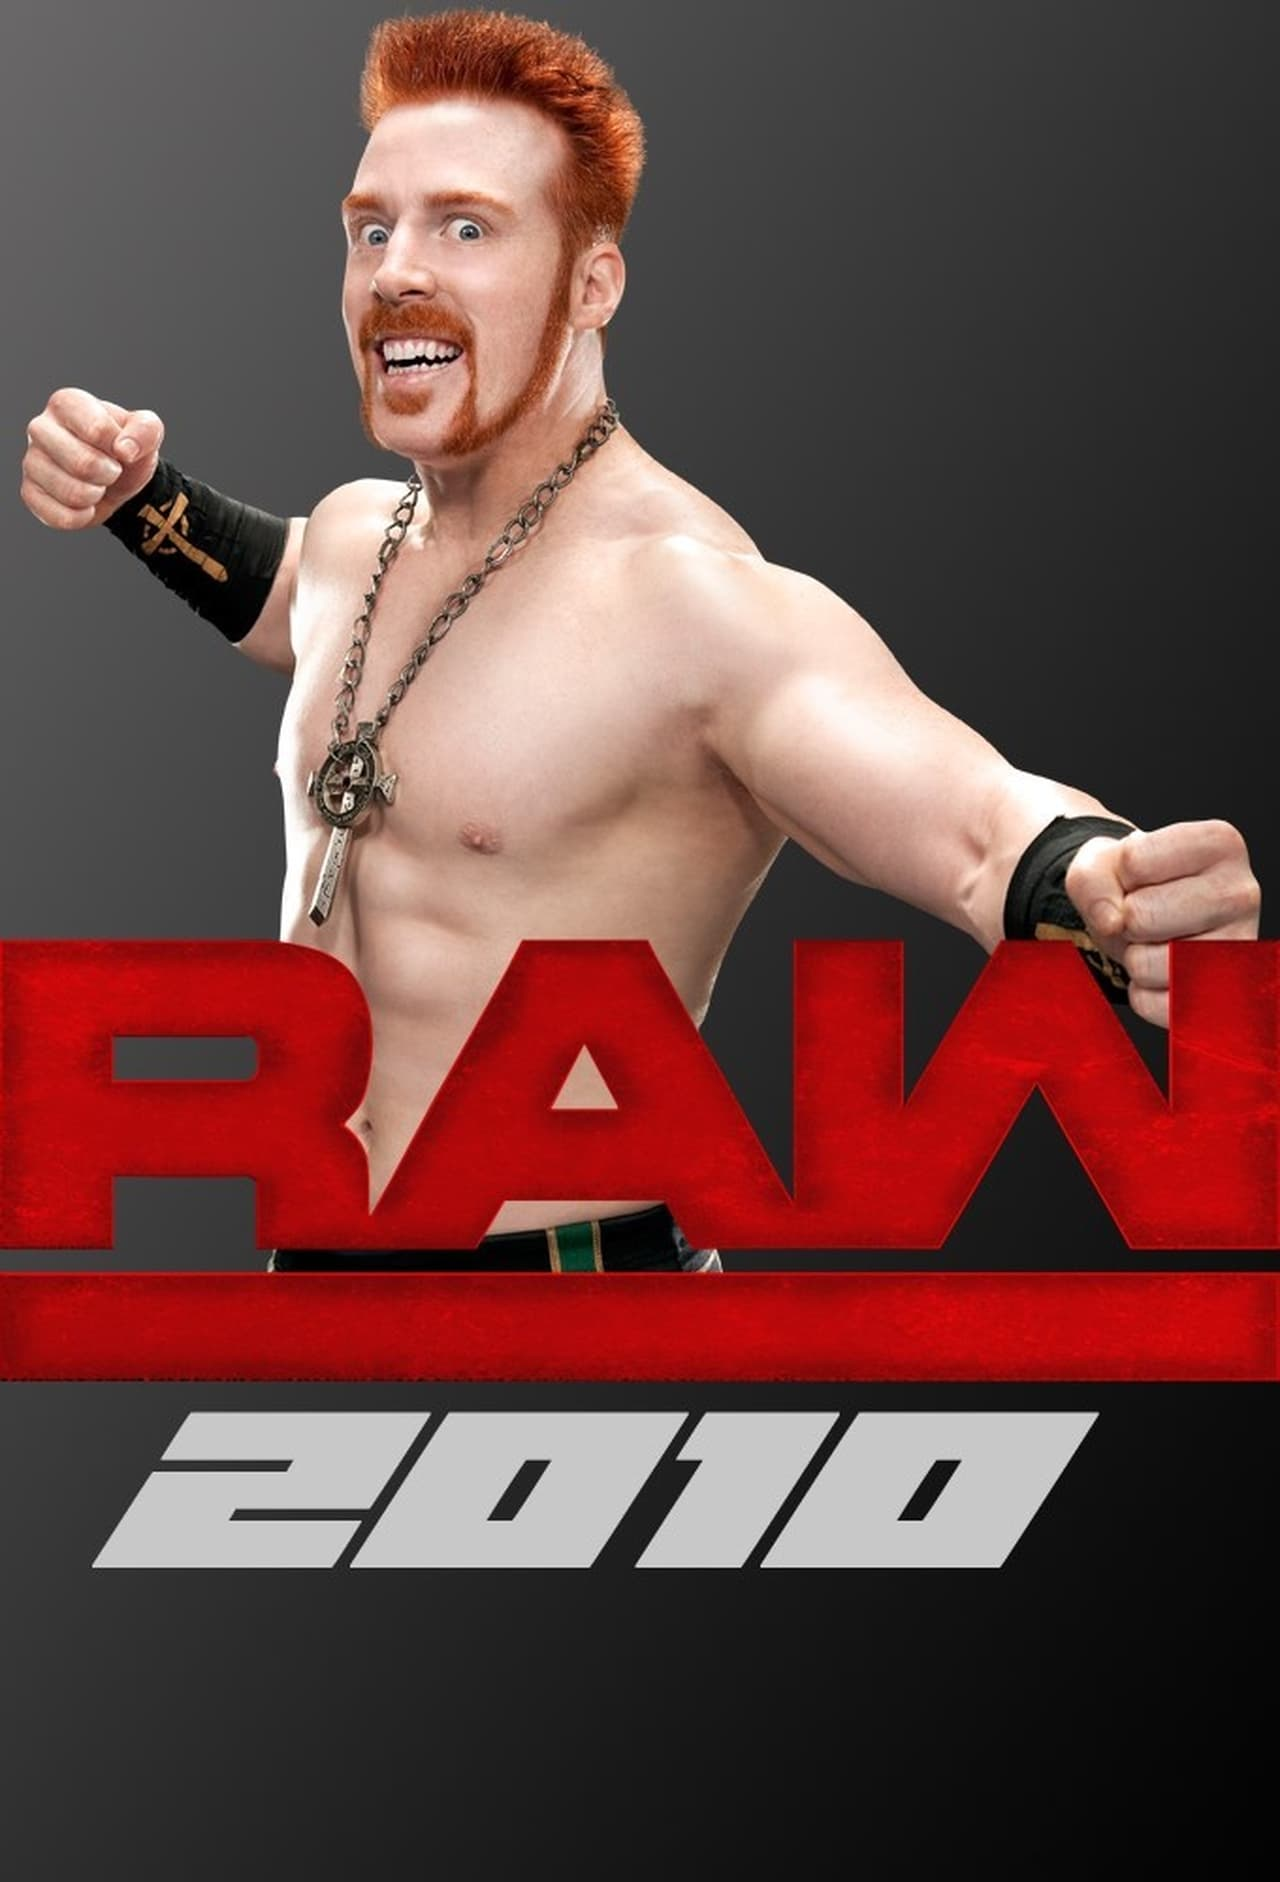 Putlocker Wwe Raw Season 18 (2010)